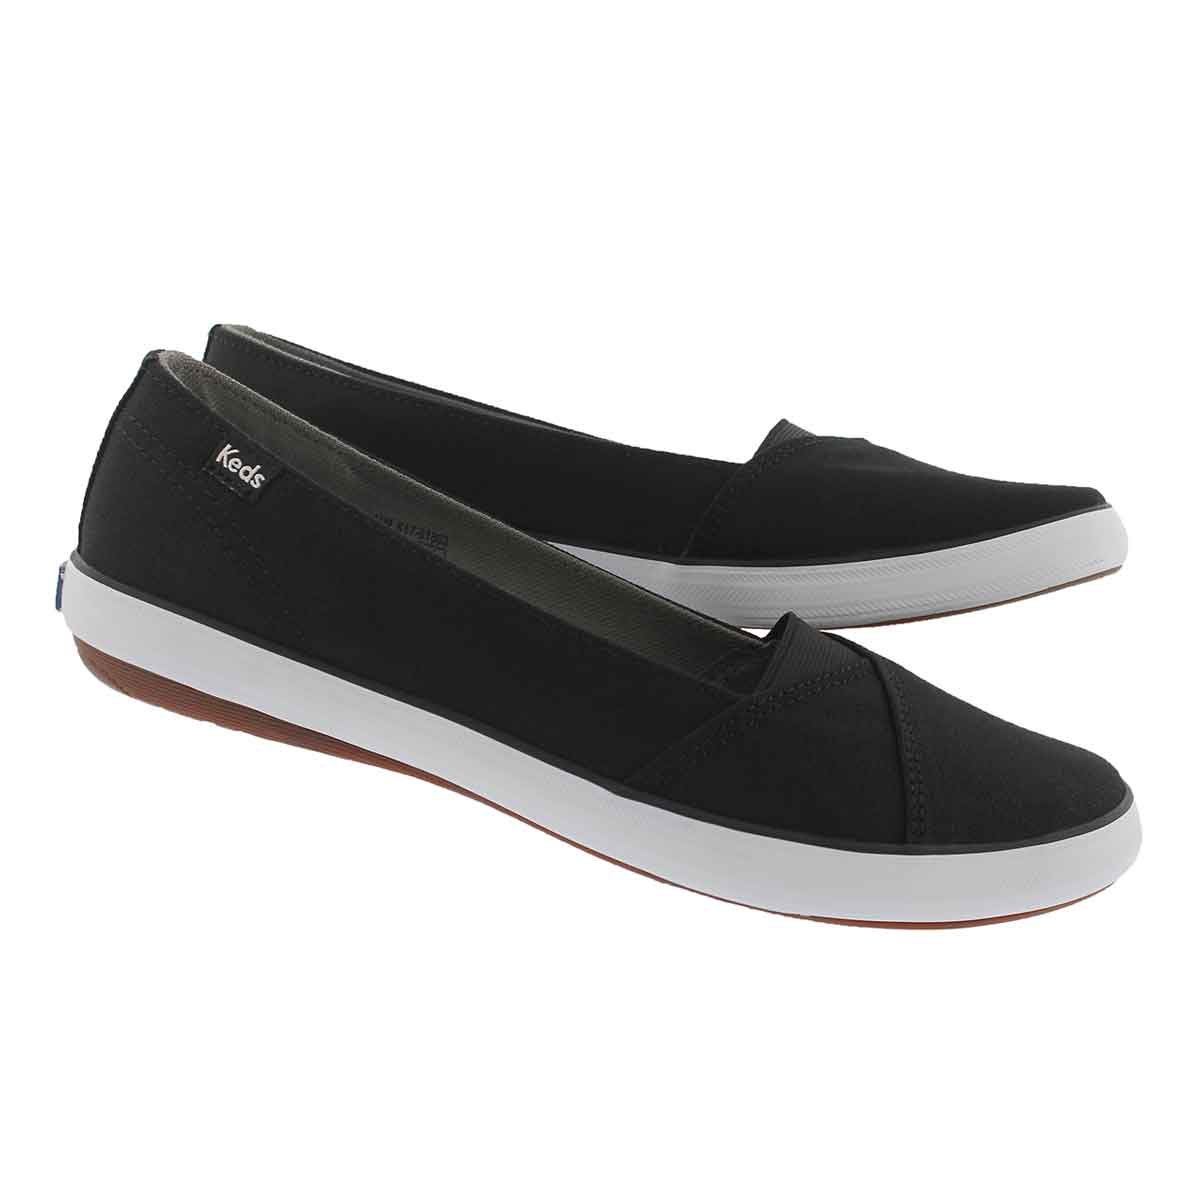 Lds Cali II black casual slip on